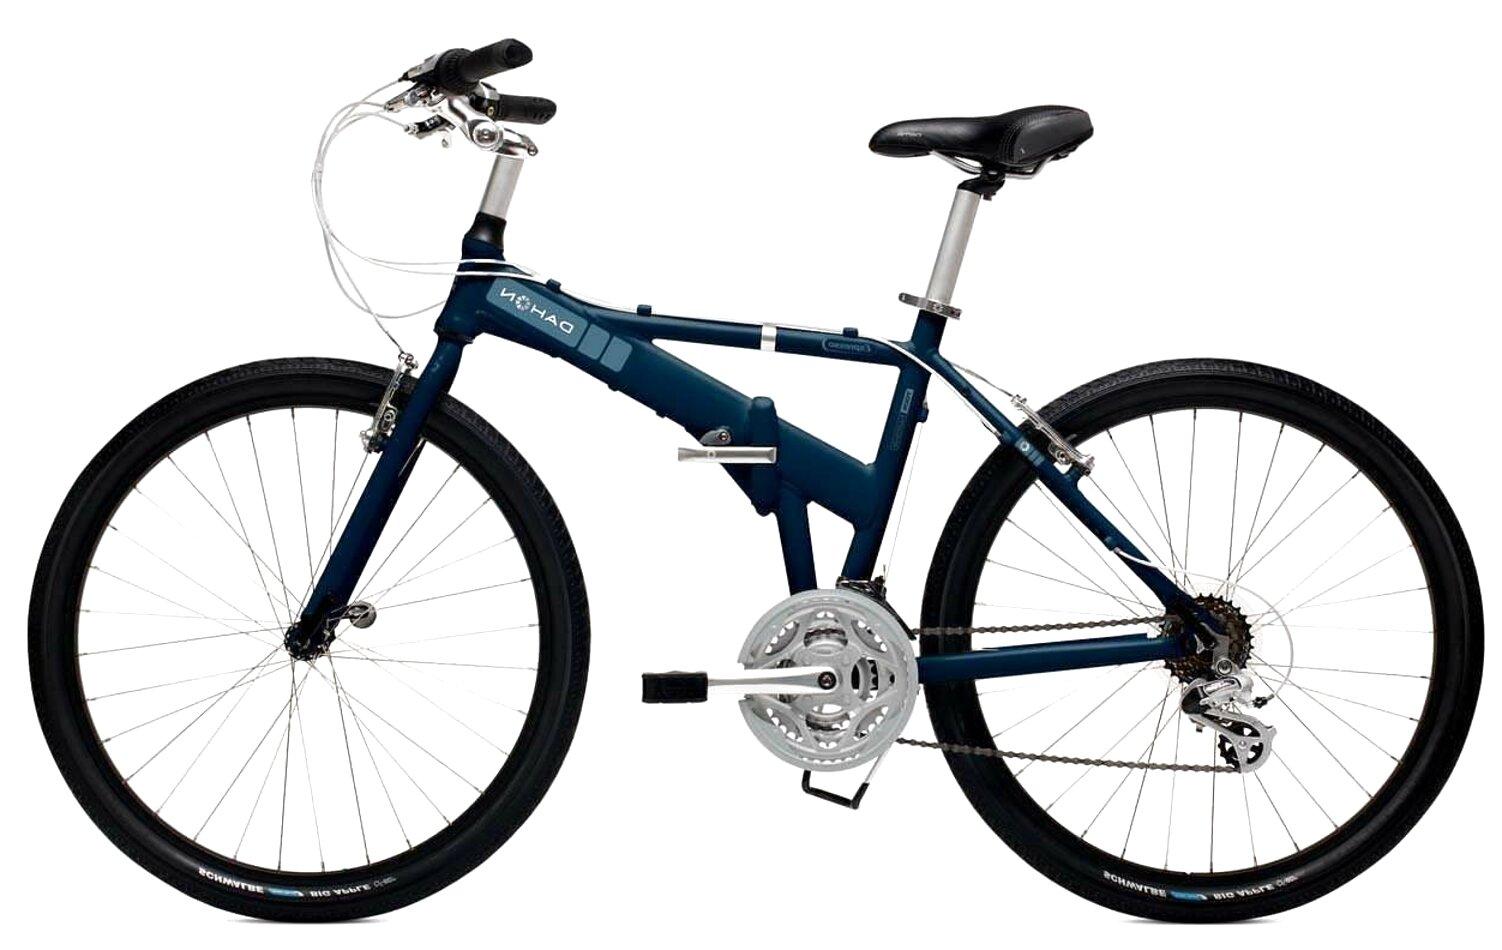 dahon espresso folding bike for sale